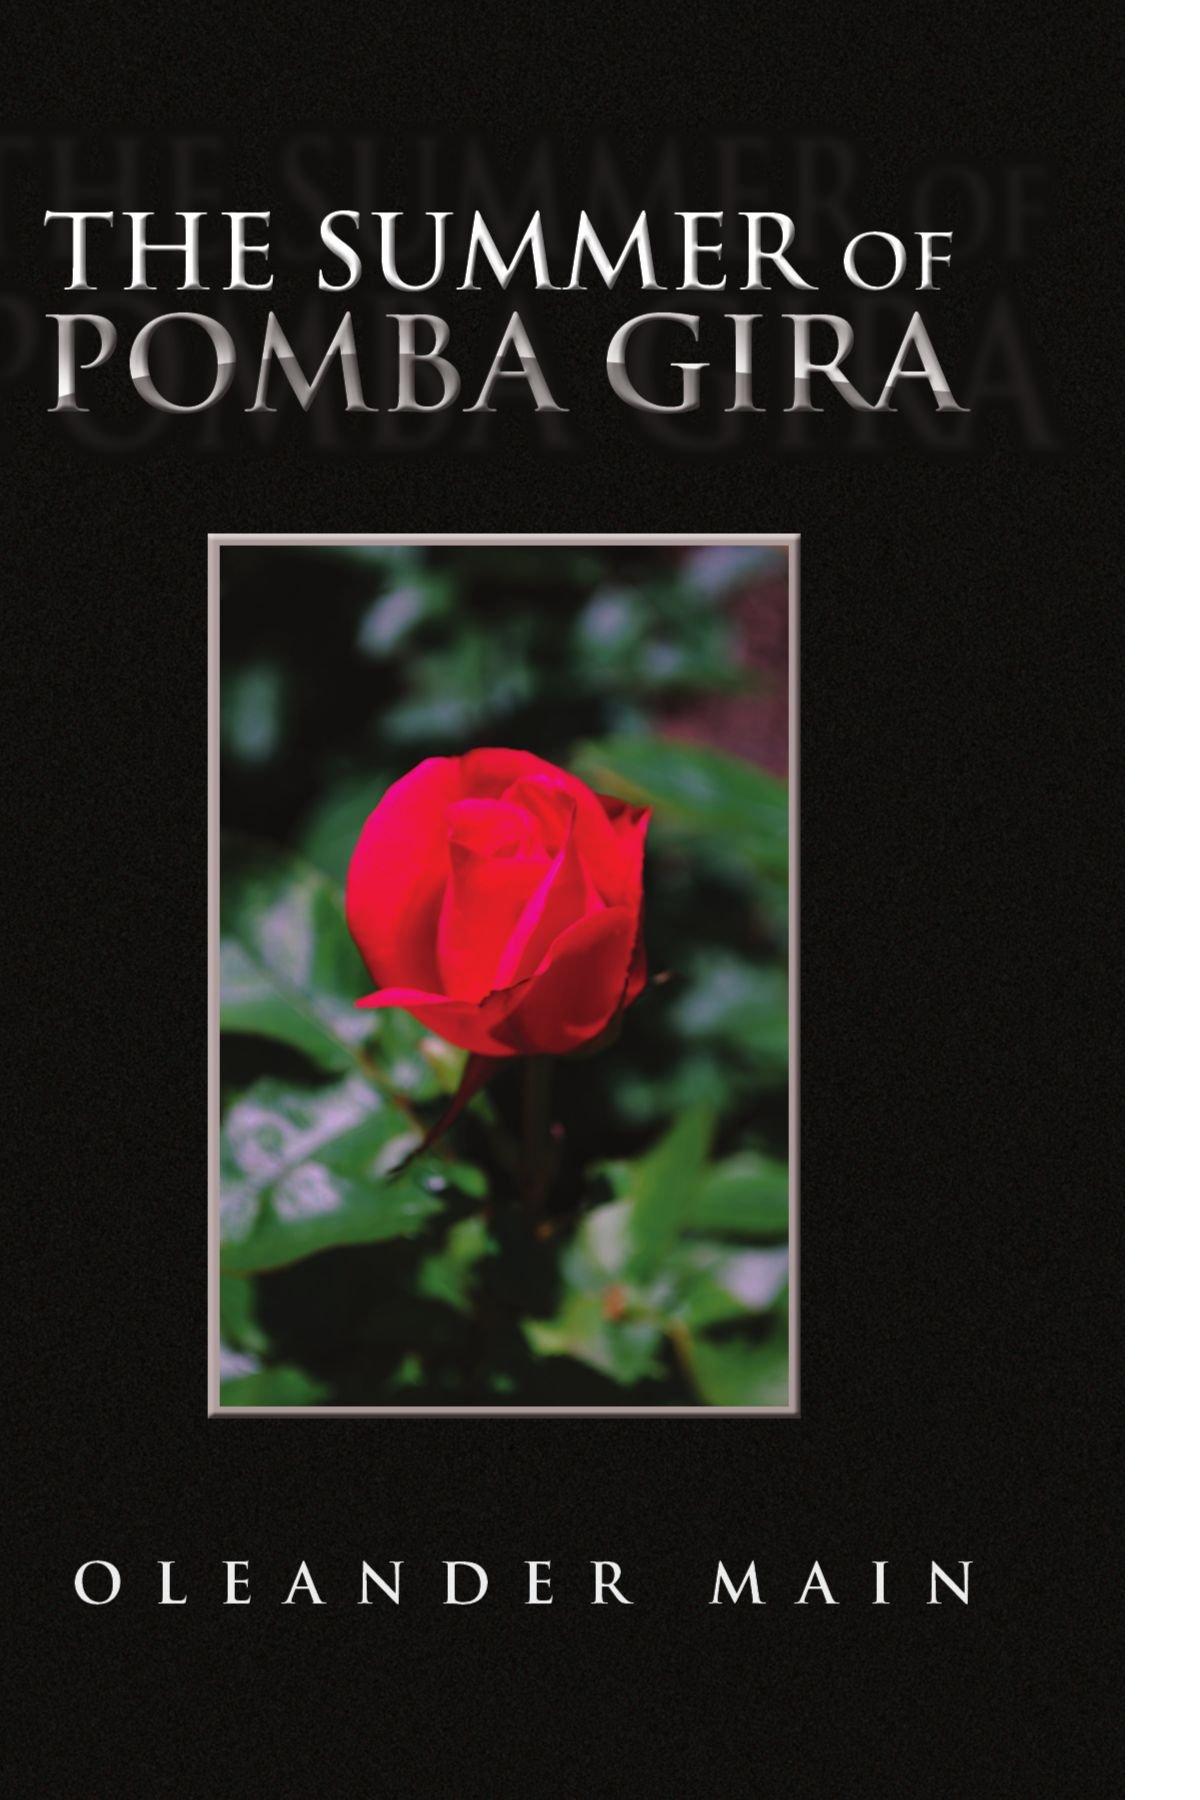 The Summer of Pomba Gira ebook